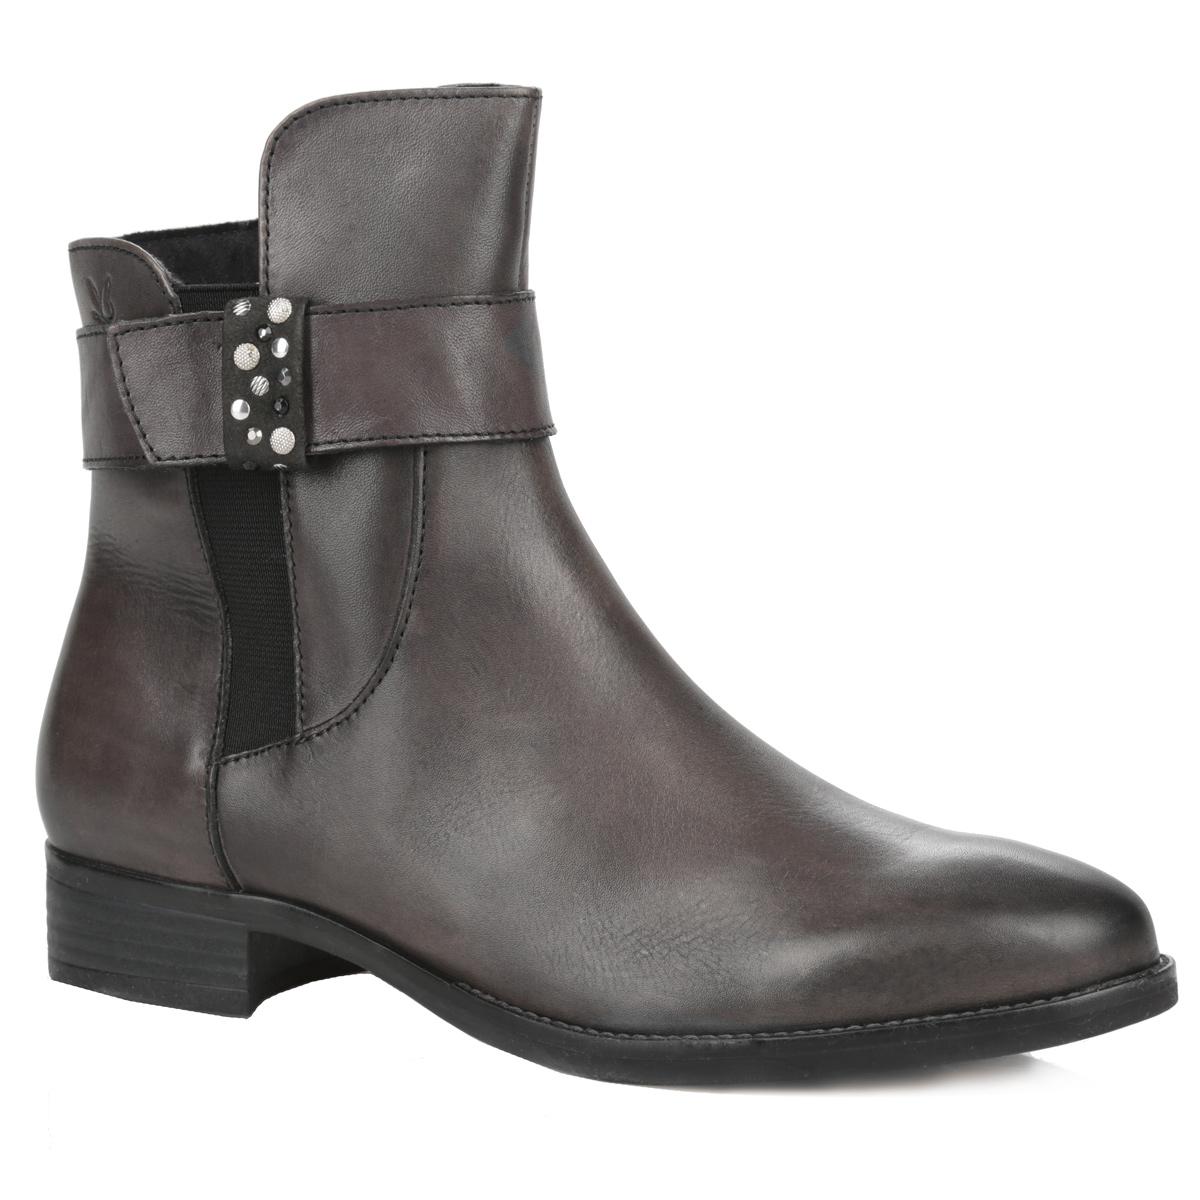 Caprice Ботинки женские. 9-9-25338-25-205